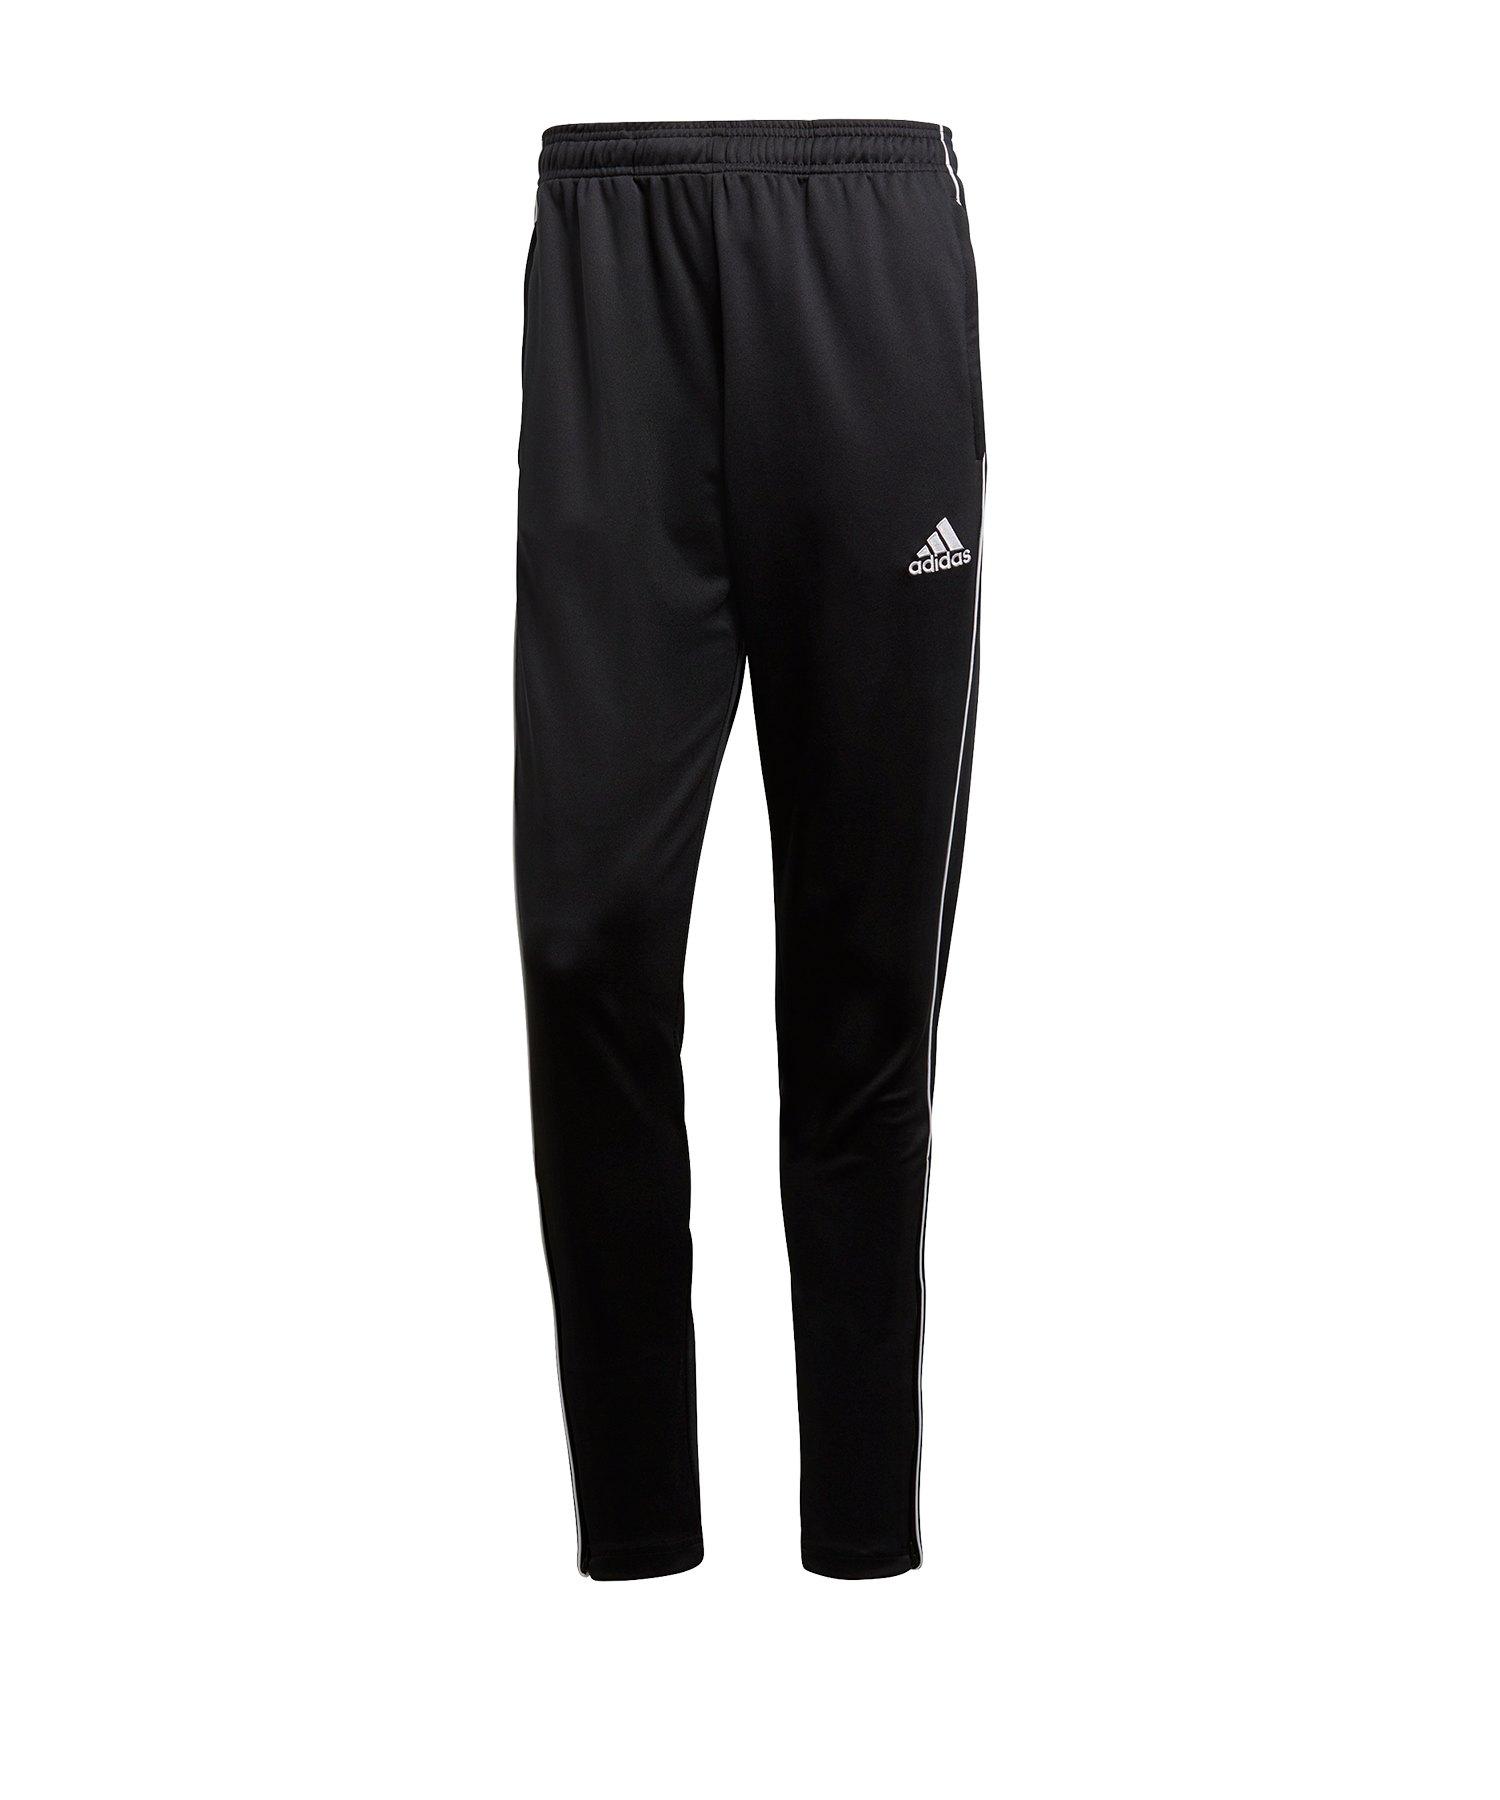 adidas Core 18 Training Pant Schwarz Weiss - schwarz